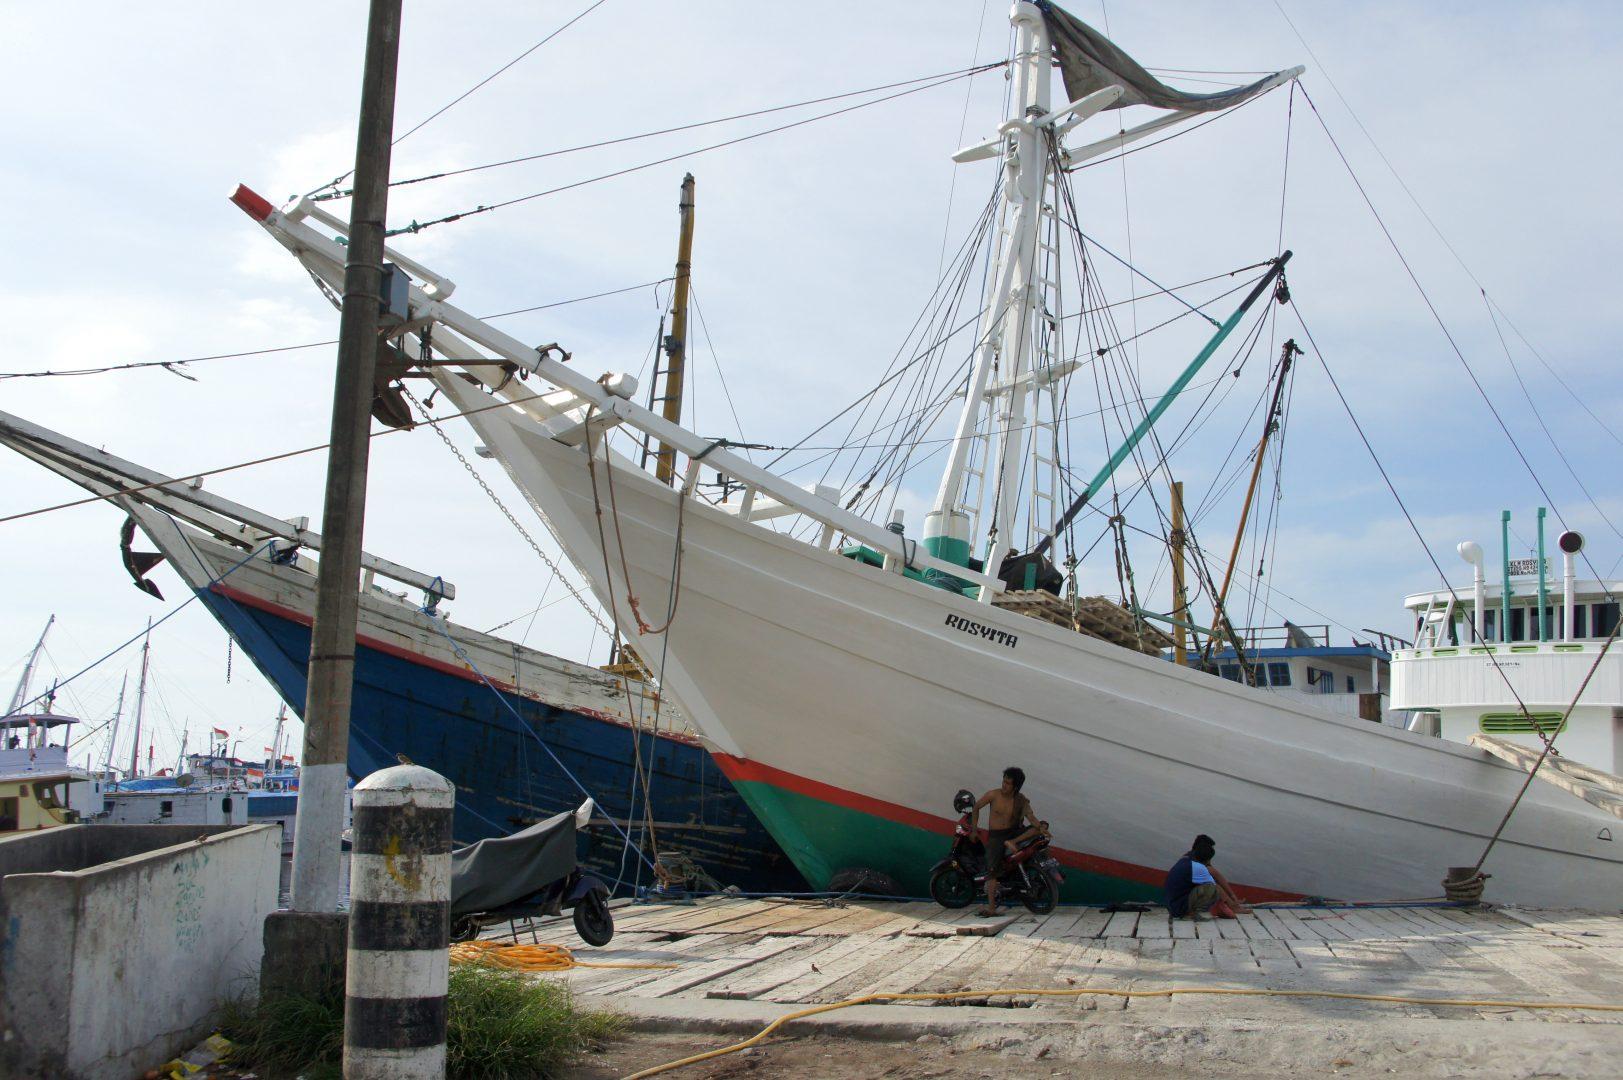 Phinisi de Sulawesi port Makassar